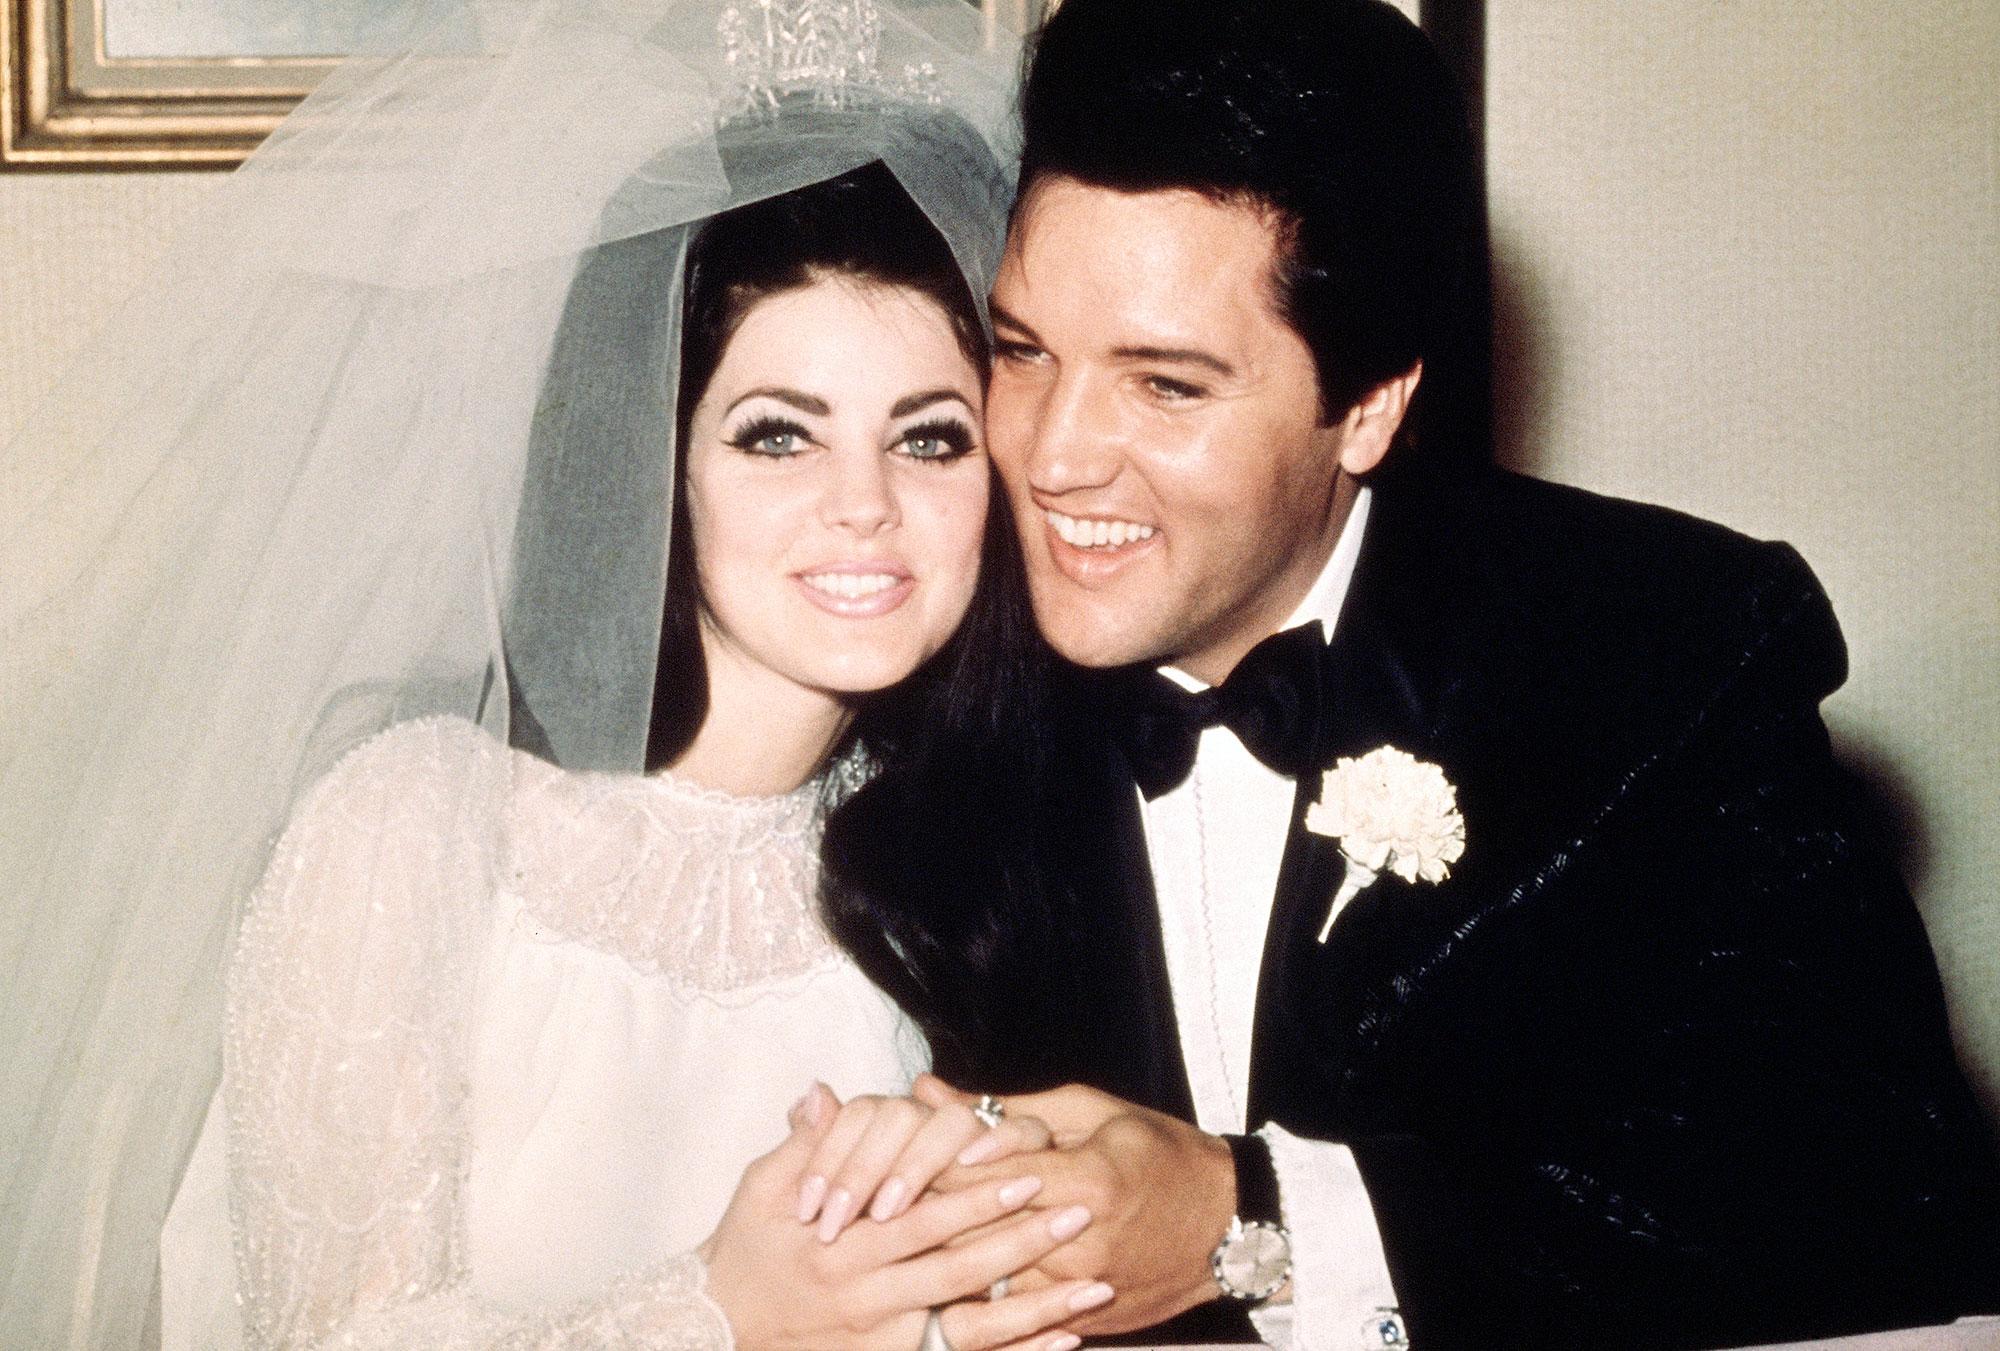 Priscilla Presley Elvis Wedding Anniversary Joe Jonas Sophie Turner Married - Priscilla Presley and Elvis Presley on their wedding day, May 1, 1967.